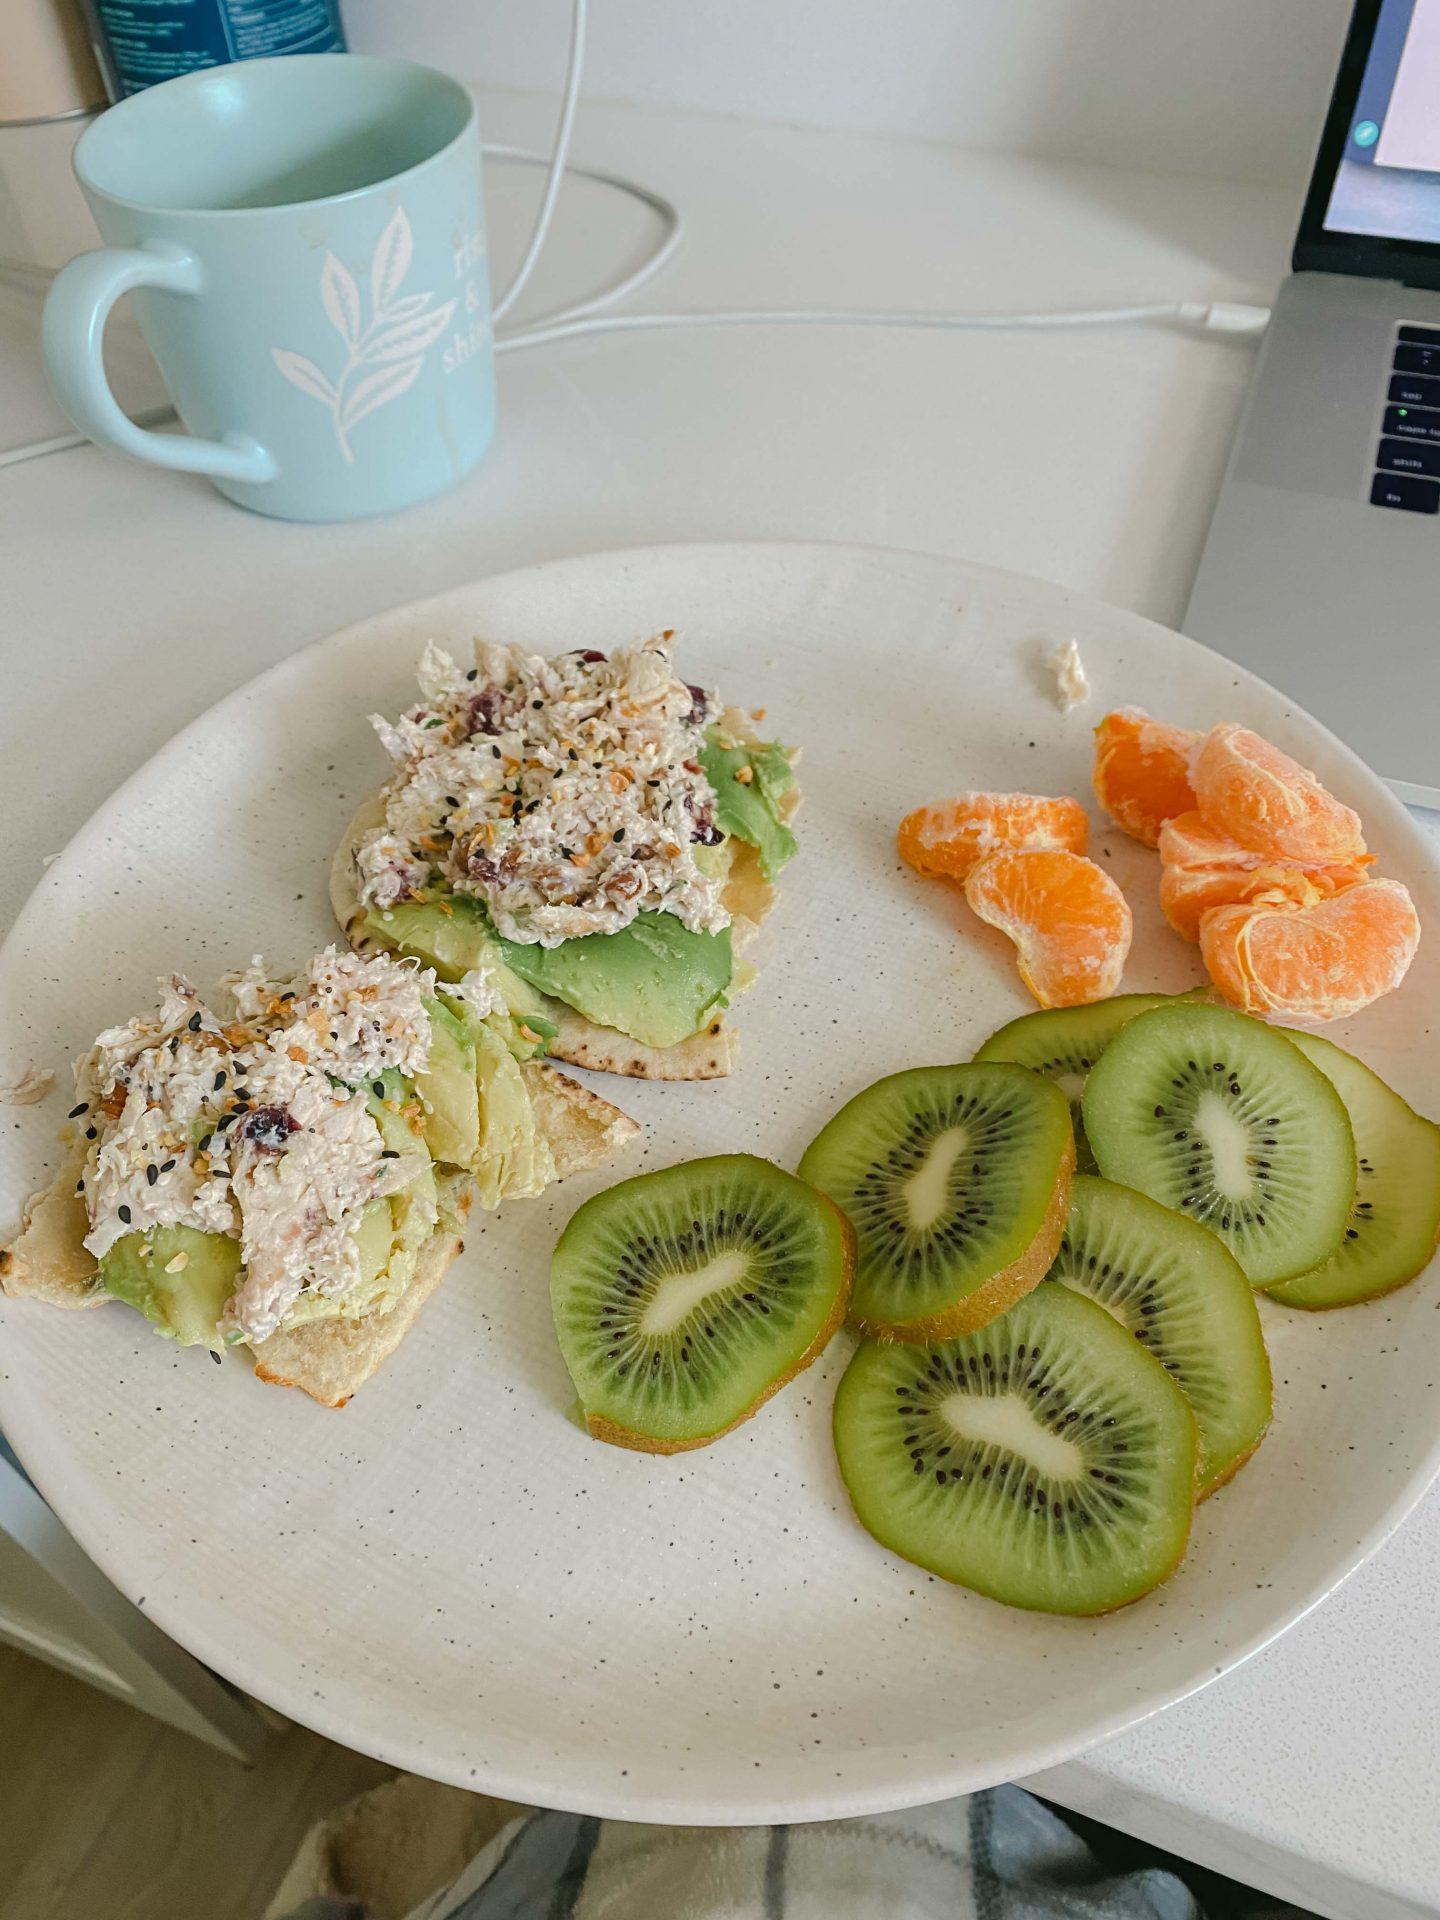 kiwi, tuna, pita, food, lunch, front porch, chicken salad, avocado, breakfast ideas